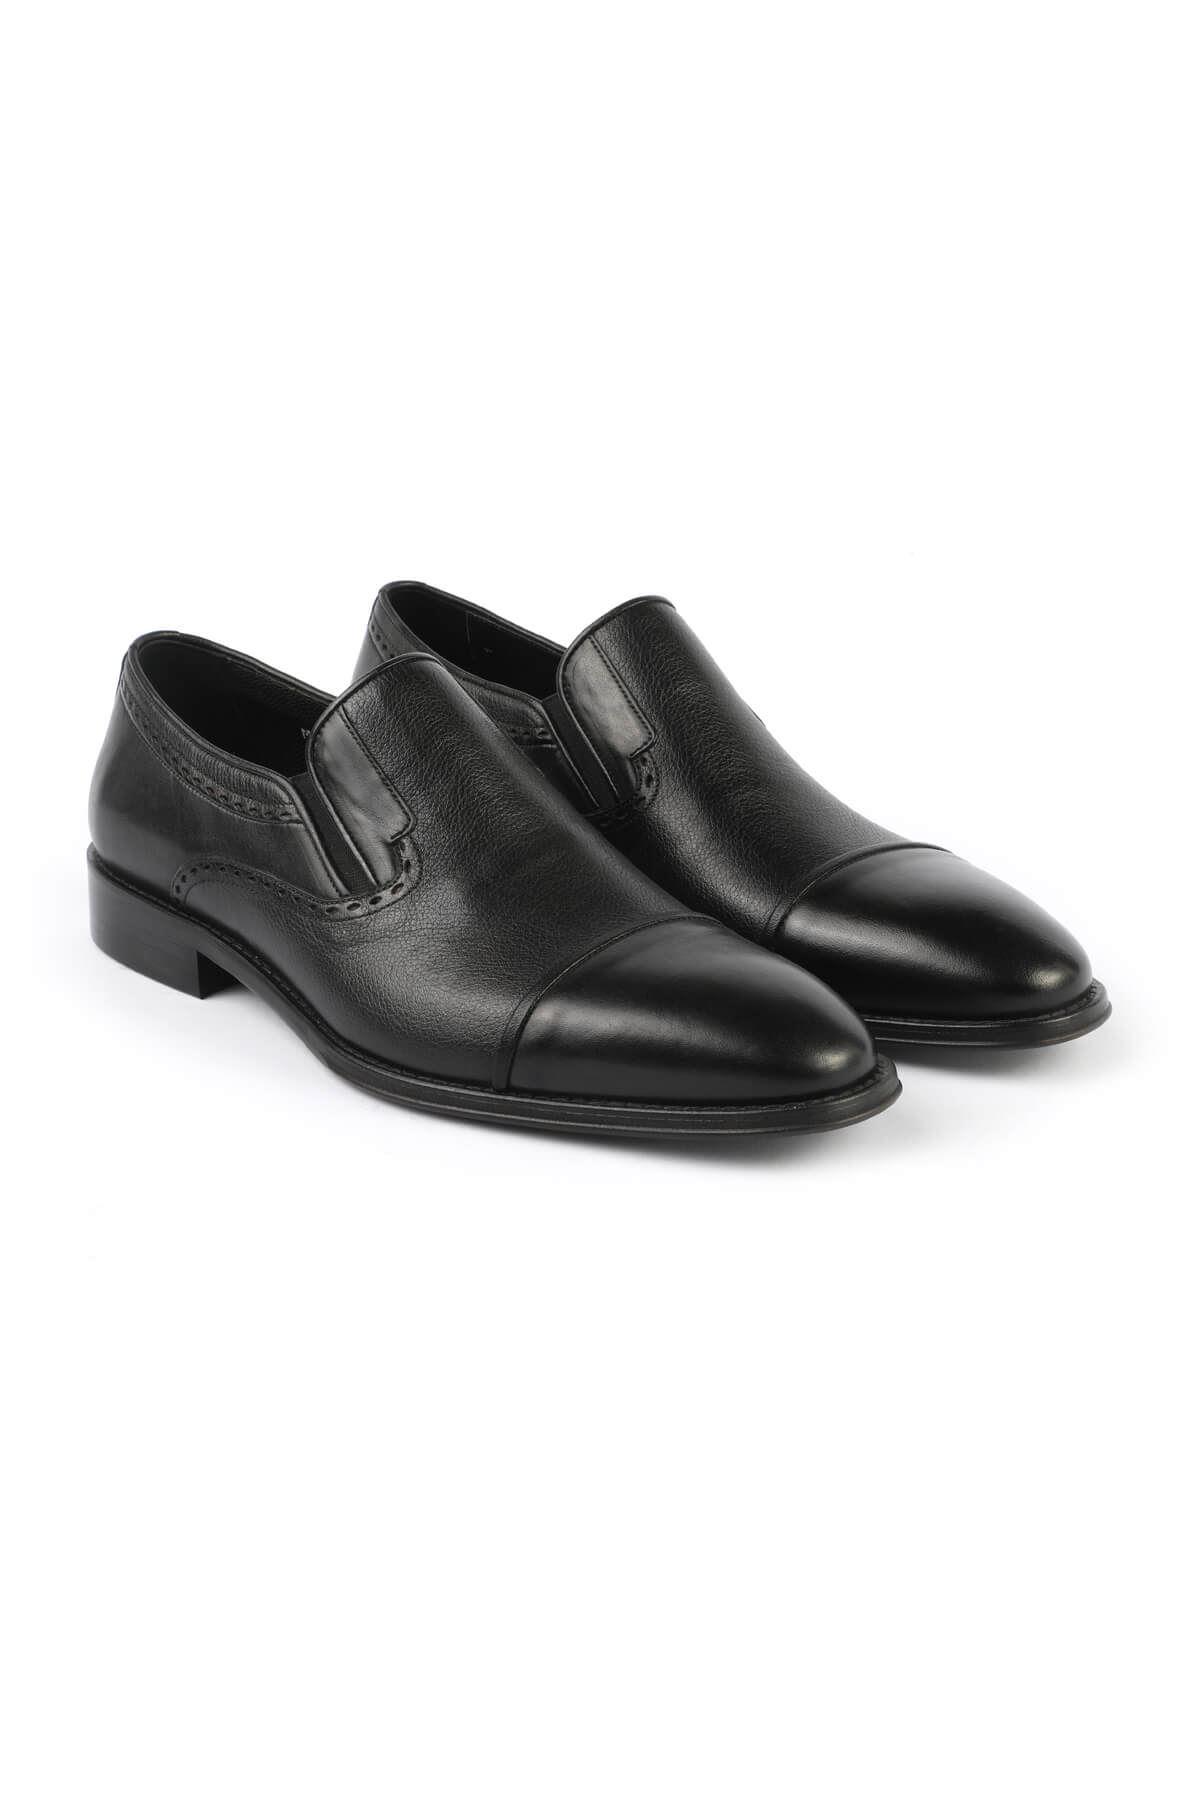 Libero 2883 Black Classic Shoes